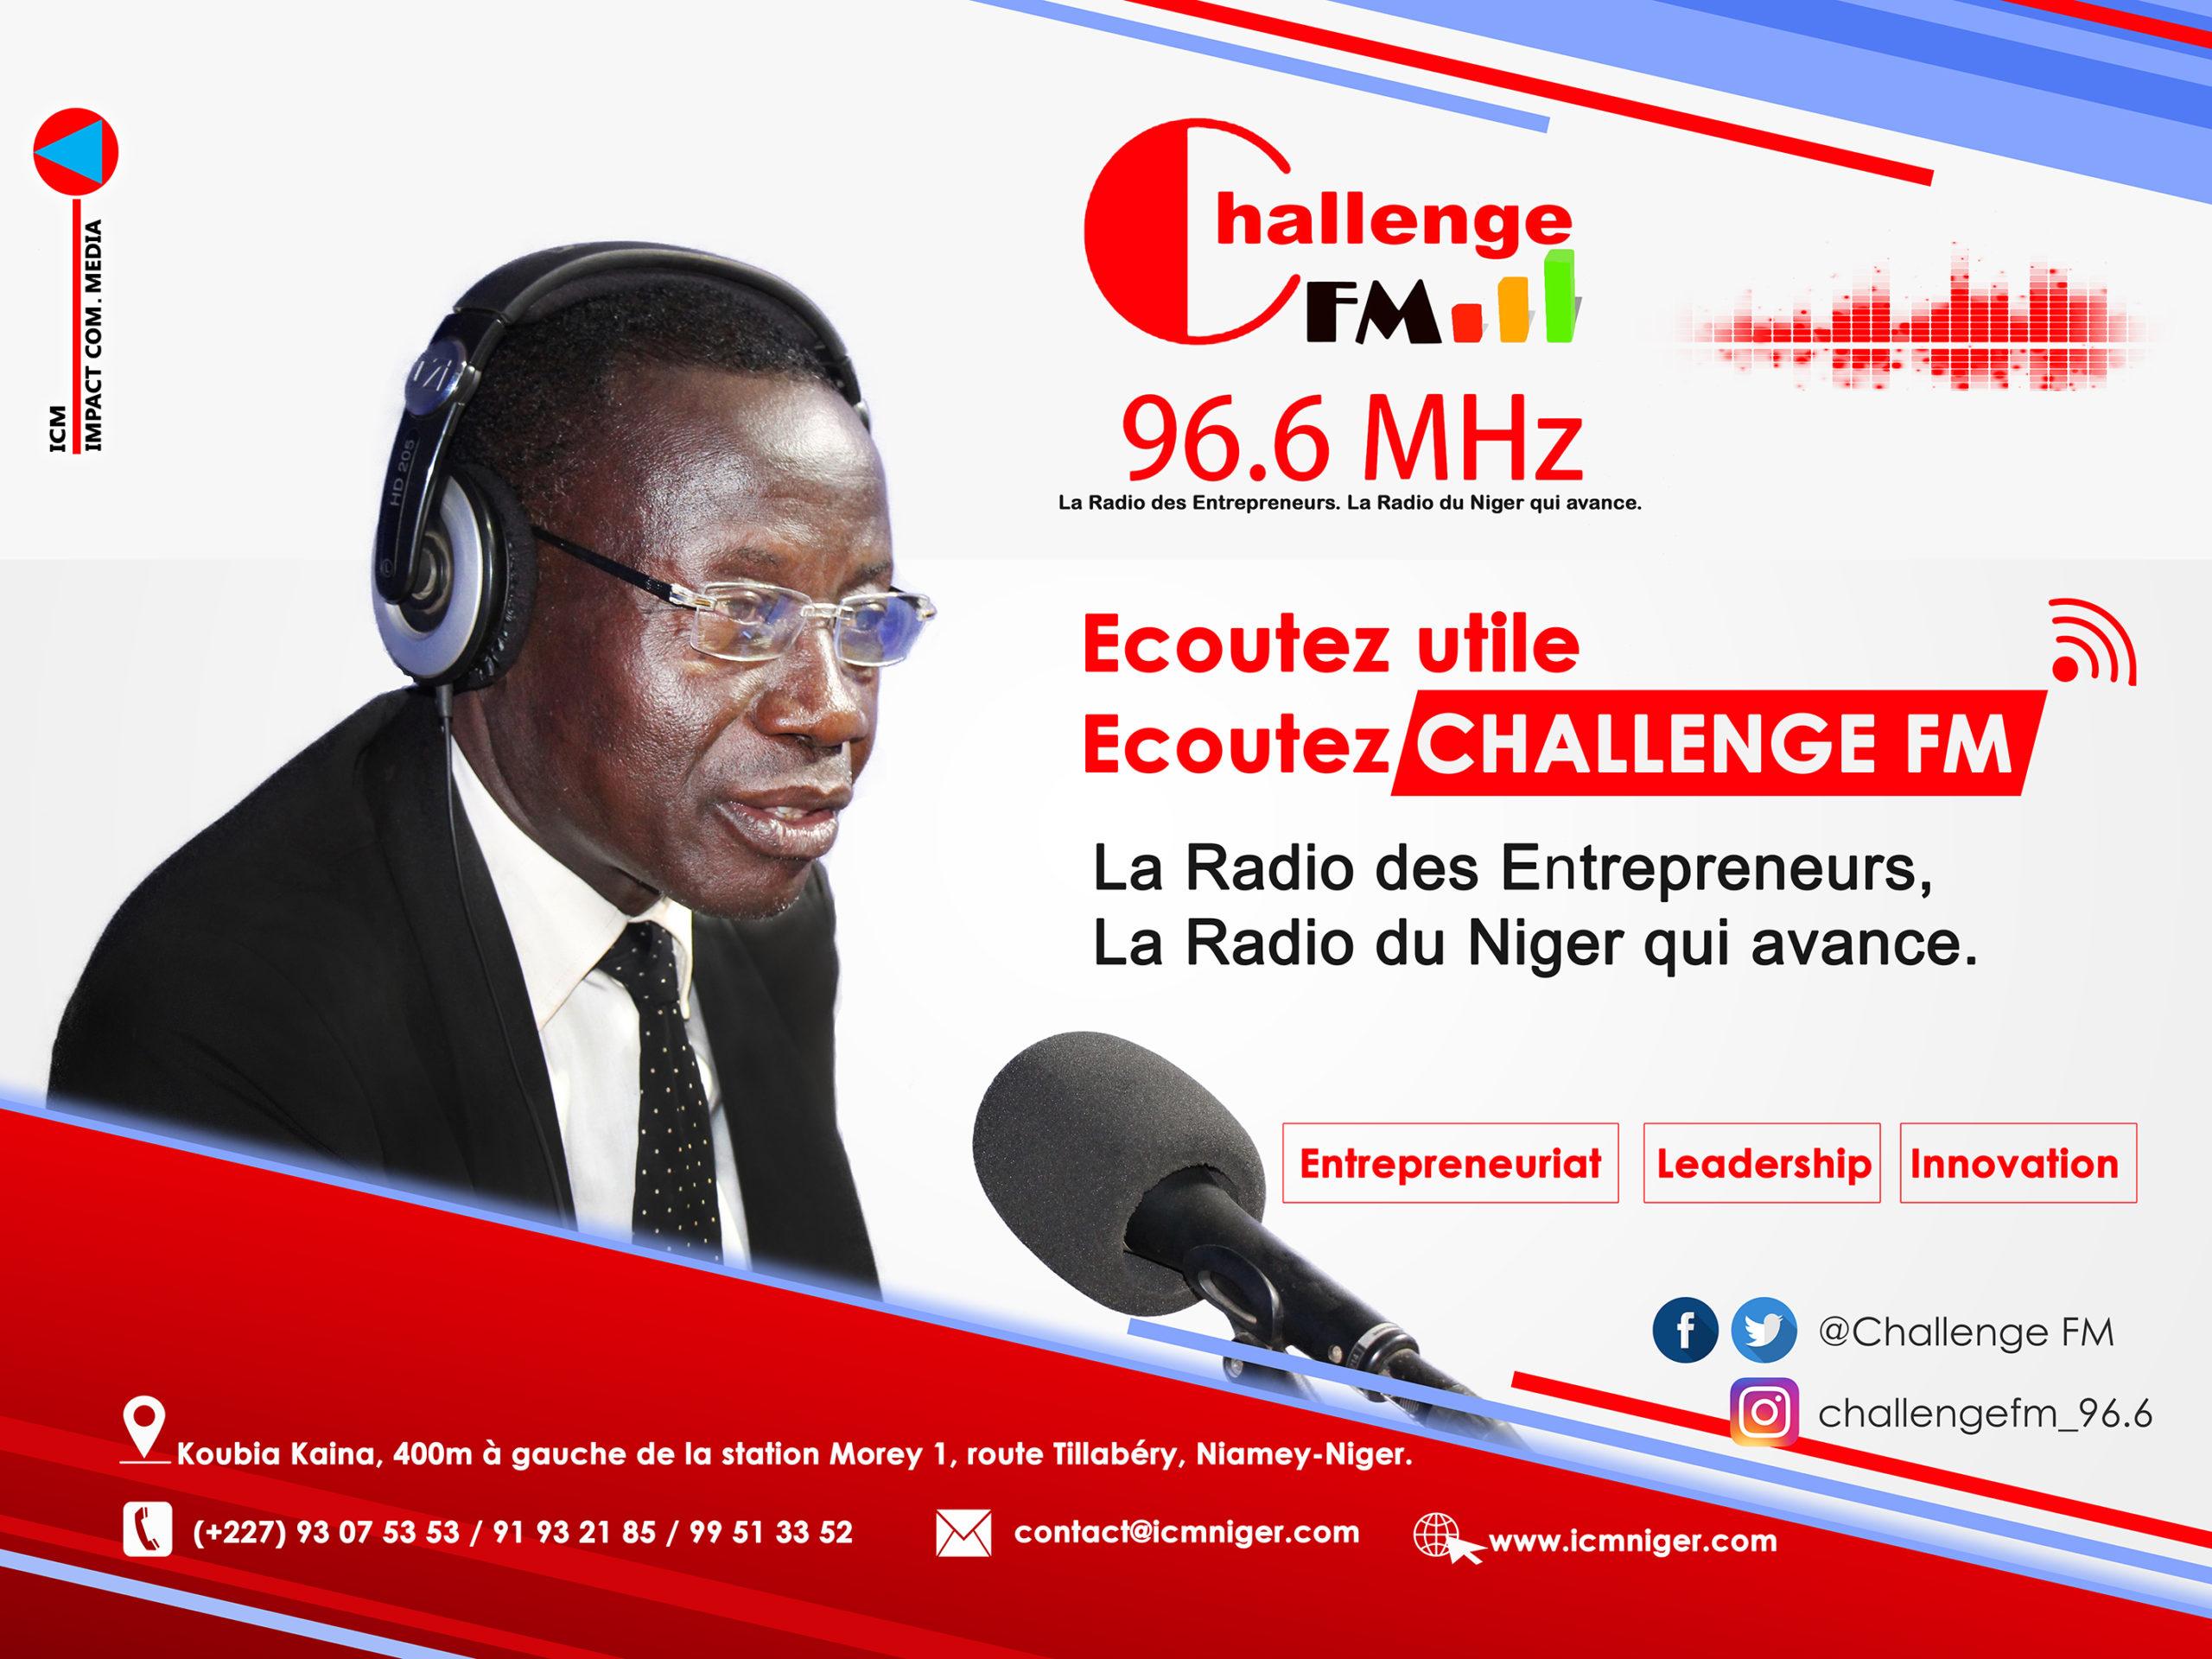 Challenge FM